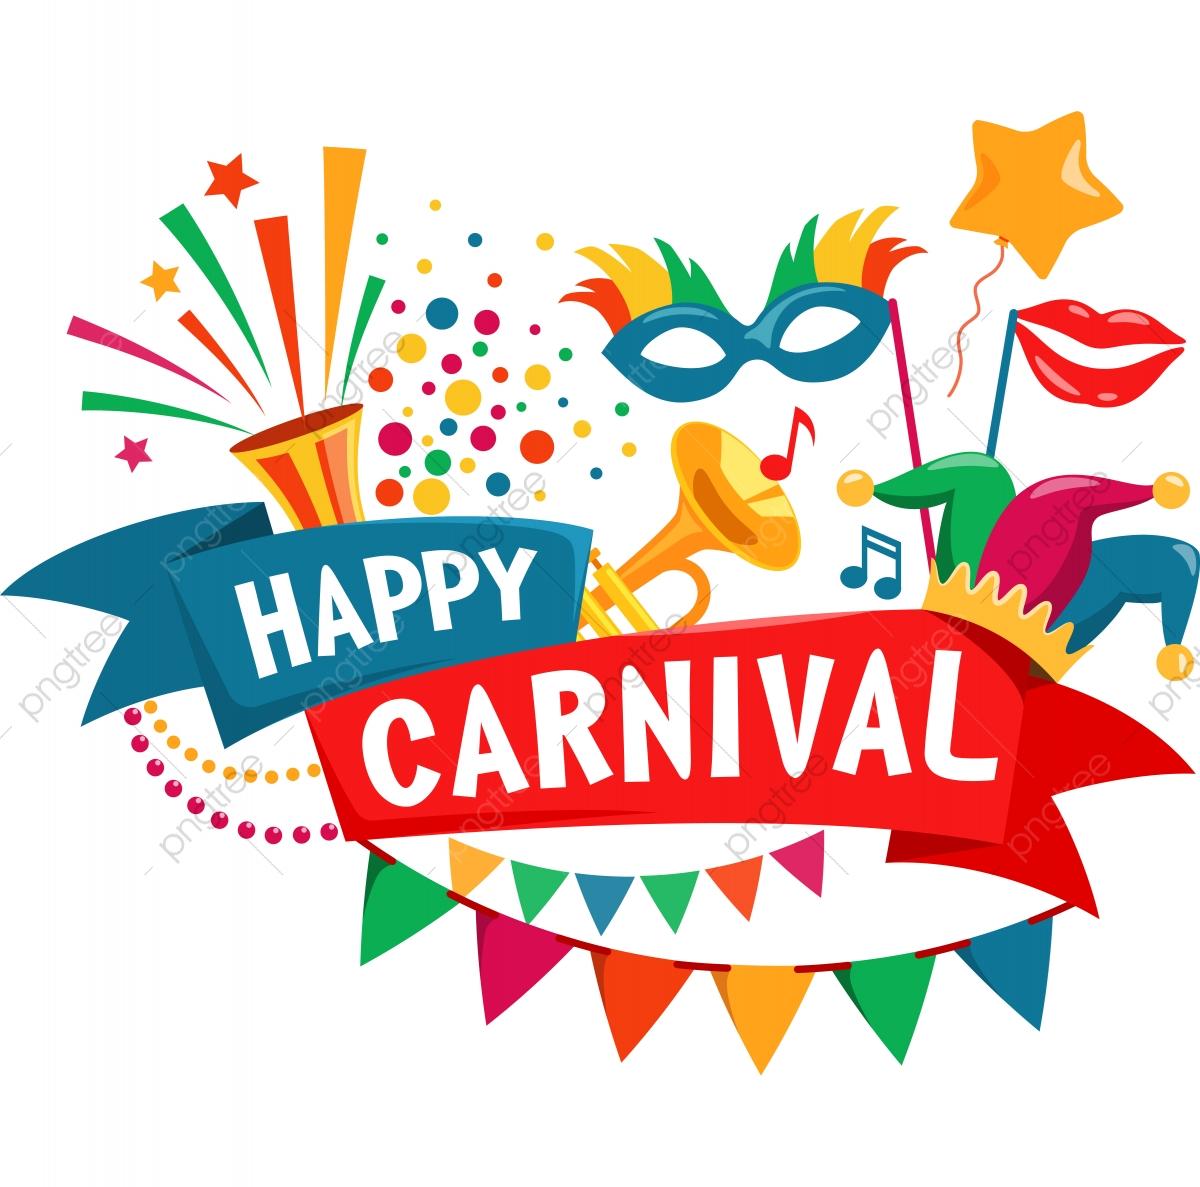 Joyeux Carnaval, Le Carnaval, Le Carnaval 2019, Lart De Carnaval PNG.